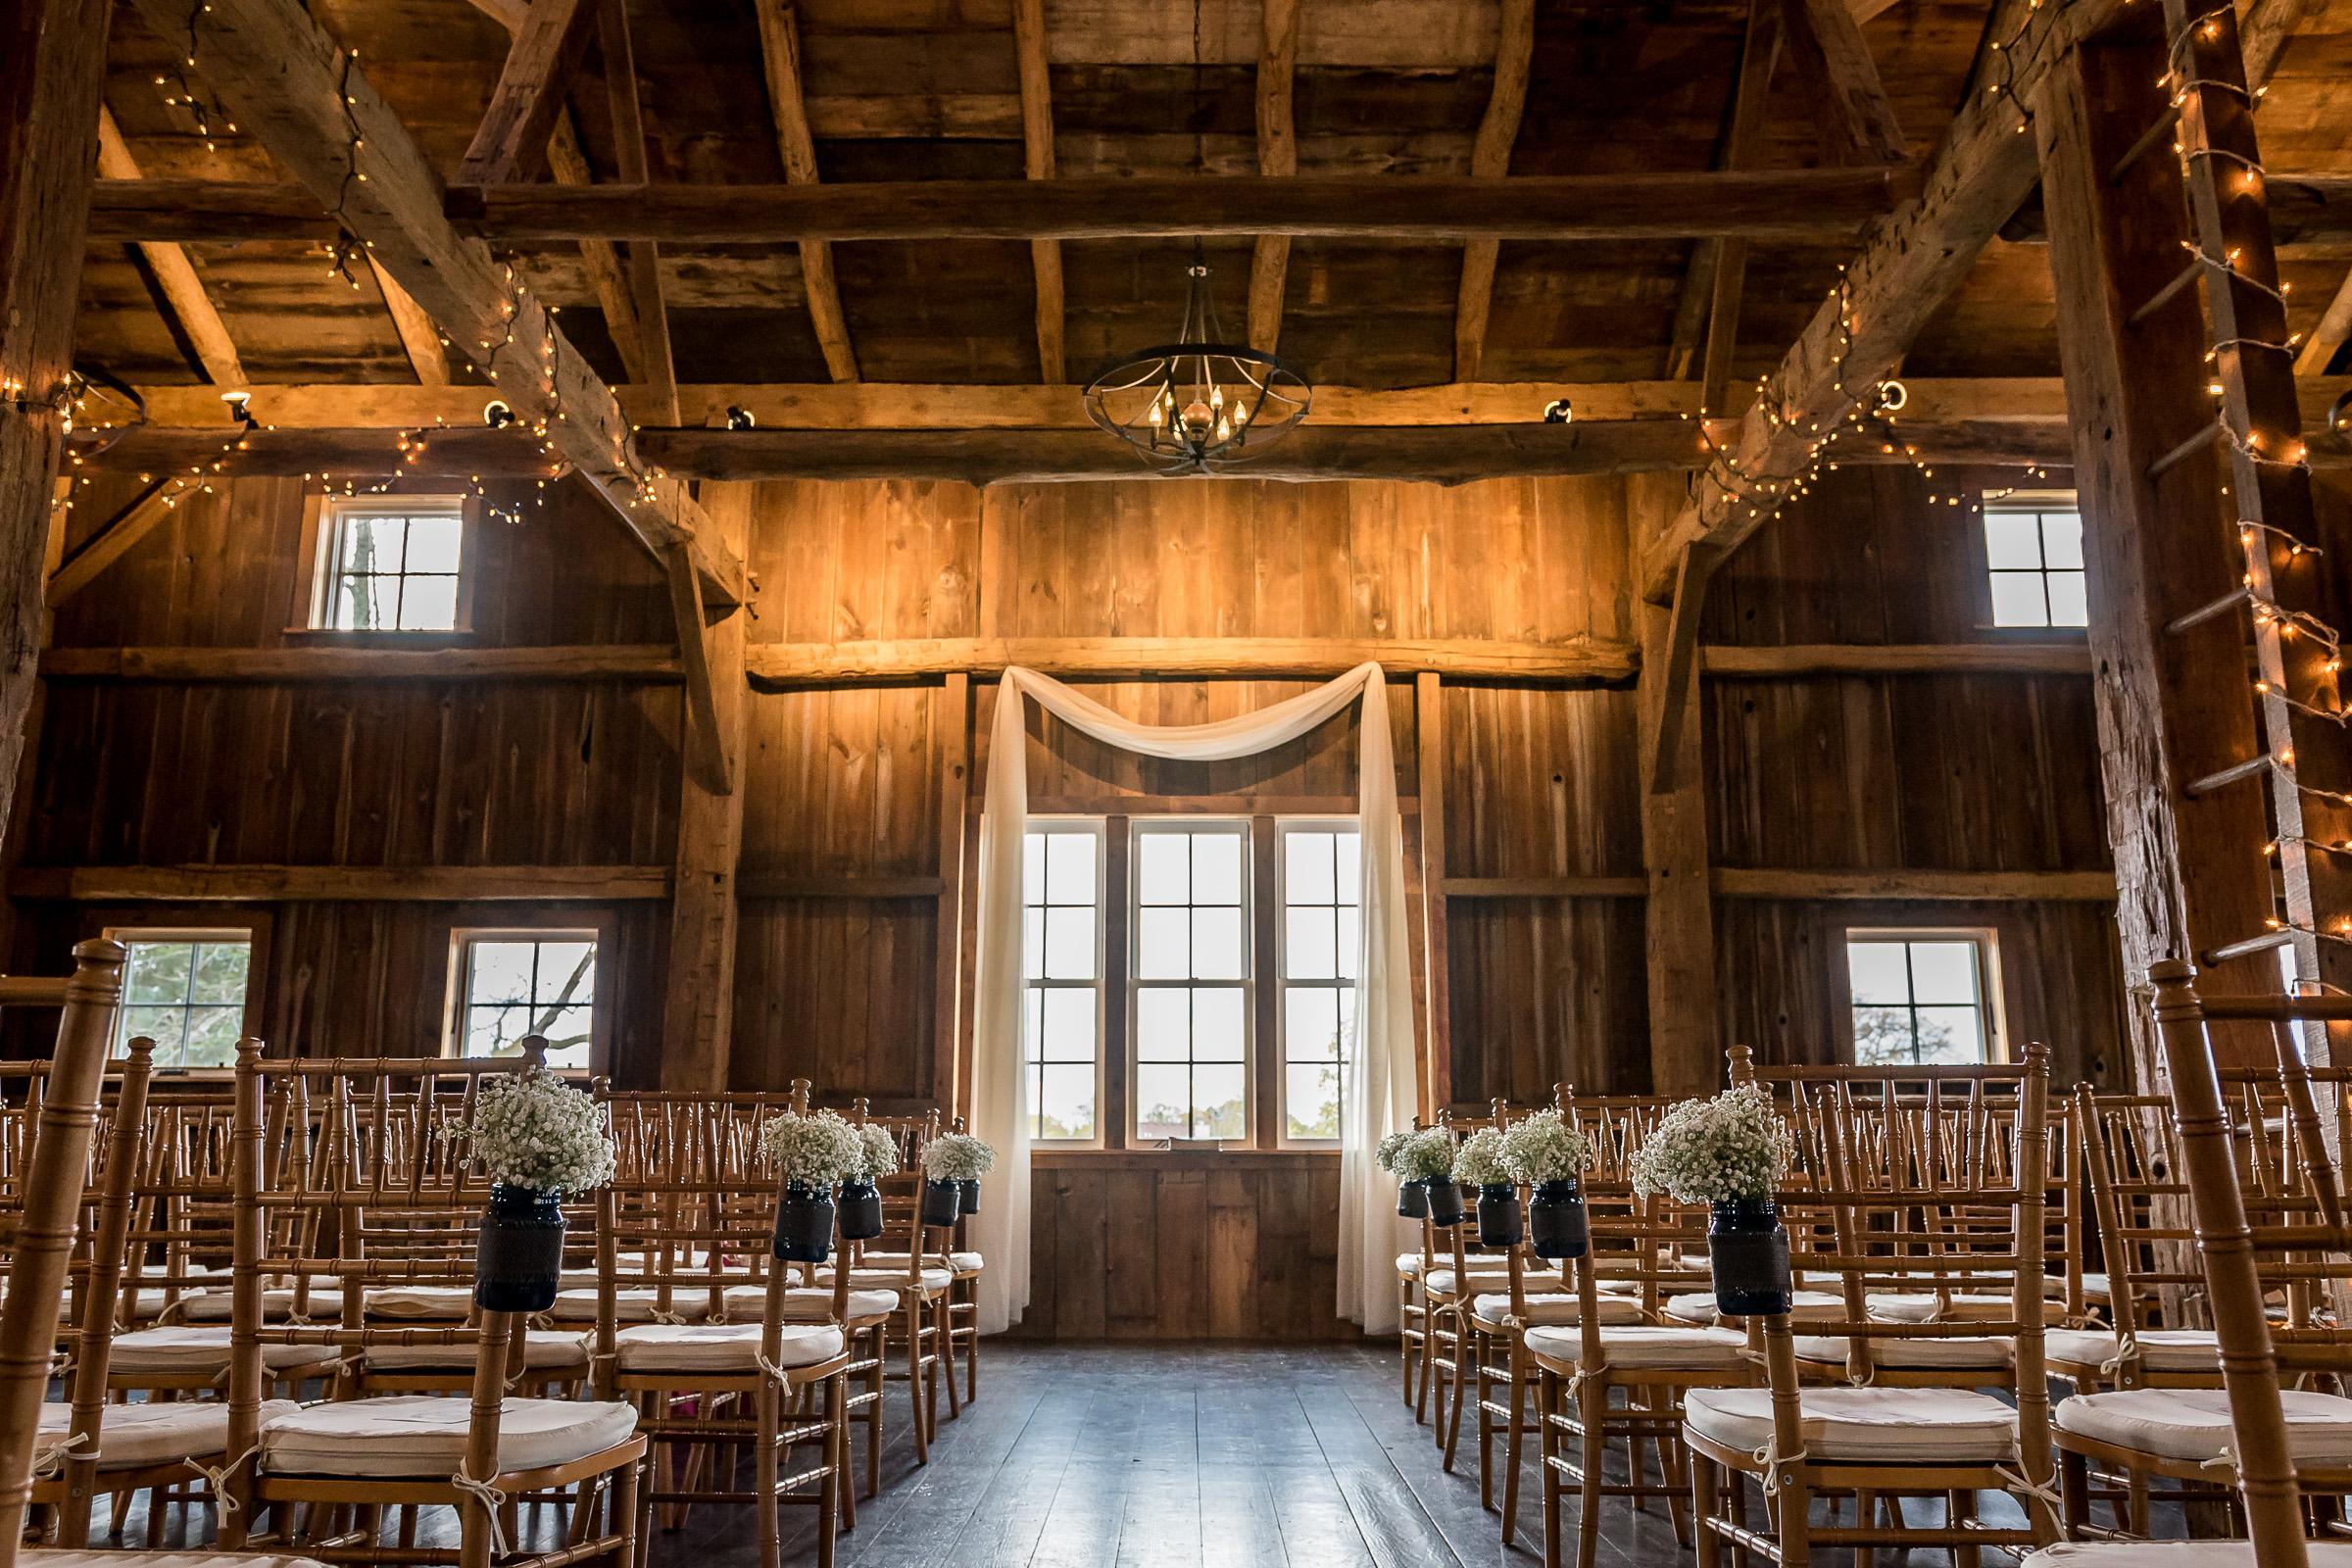 Intimate Wedding Venues in Michigan - All Inclusive Wedding